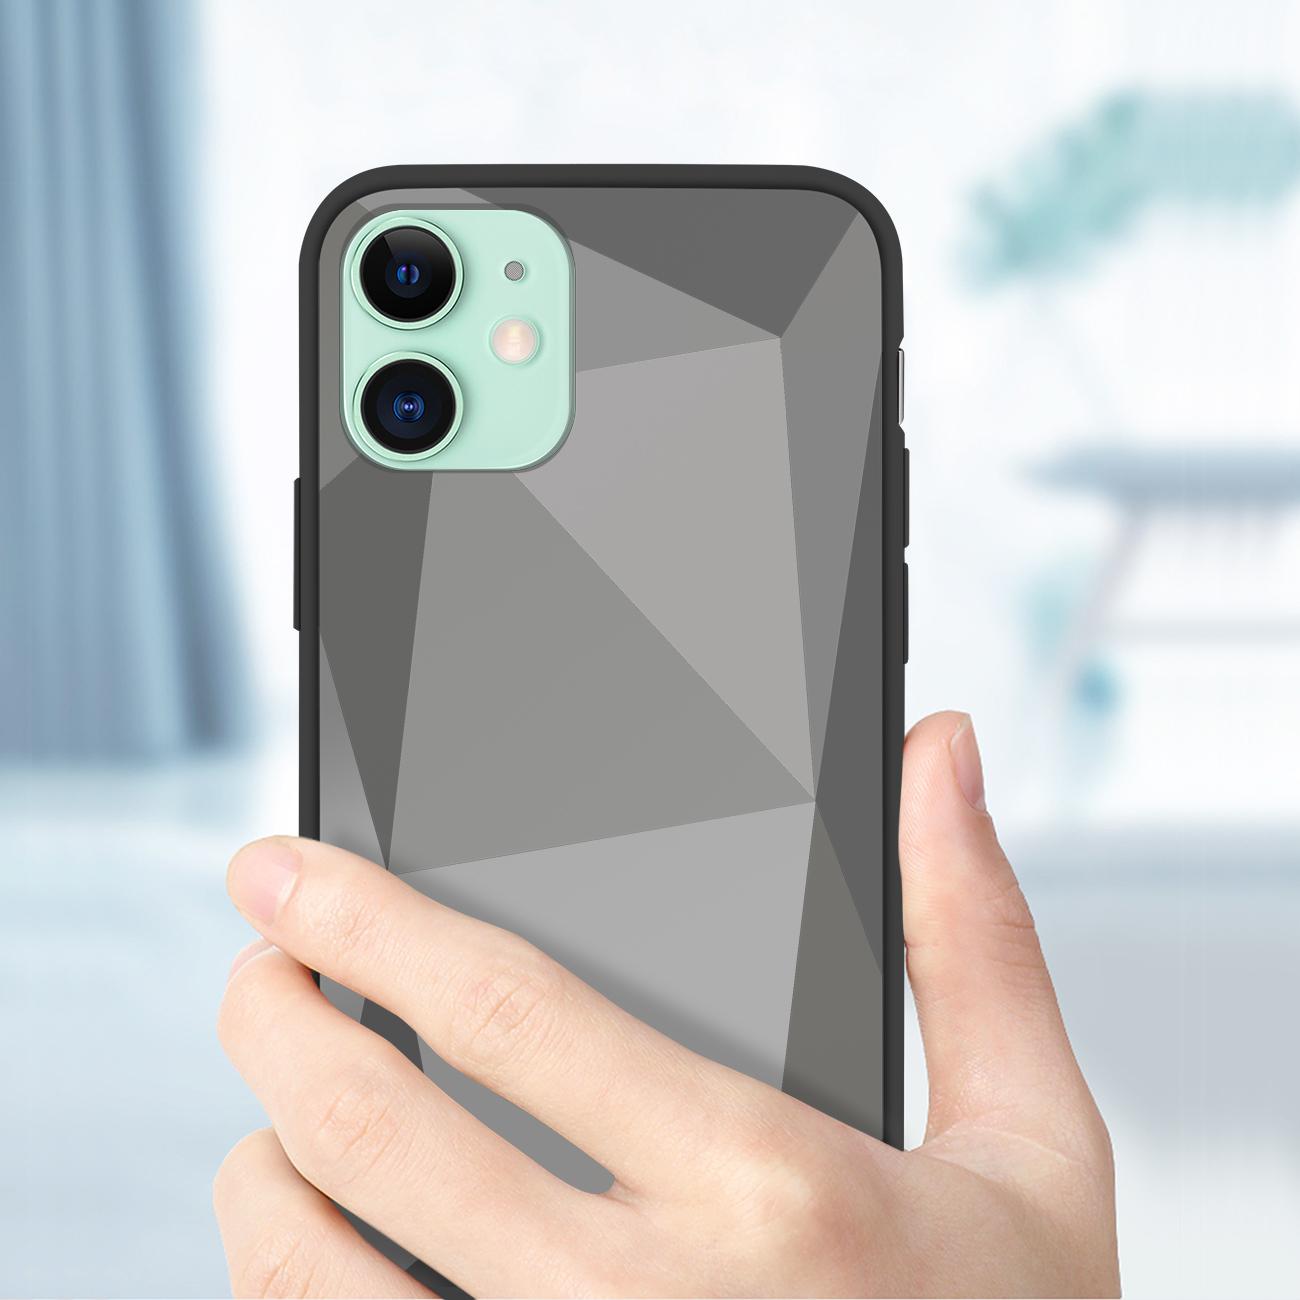 Apple iPhone 11 Apple Diamond Cases In Black